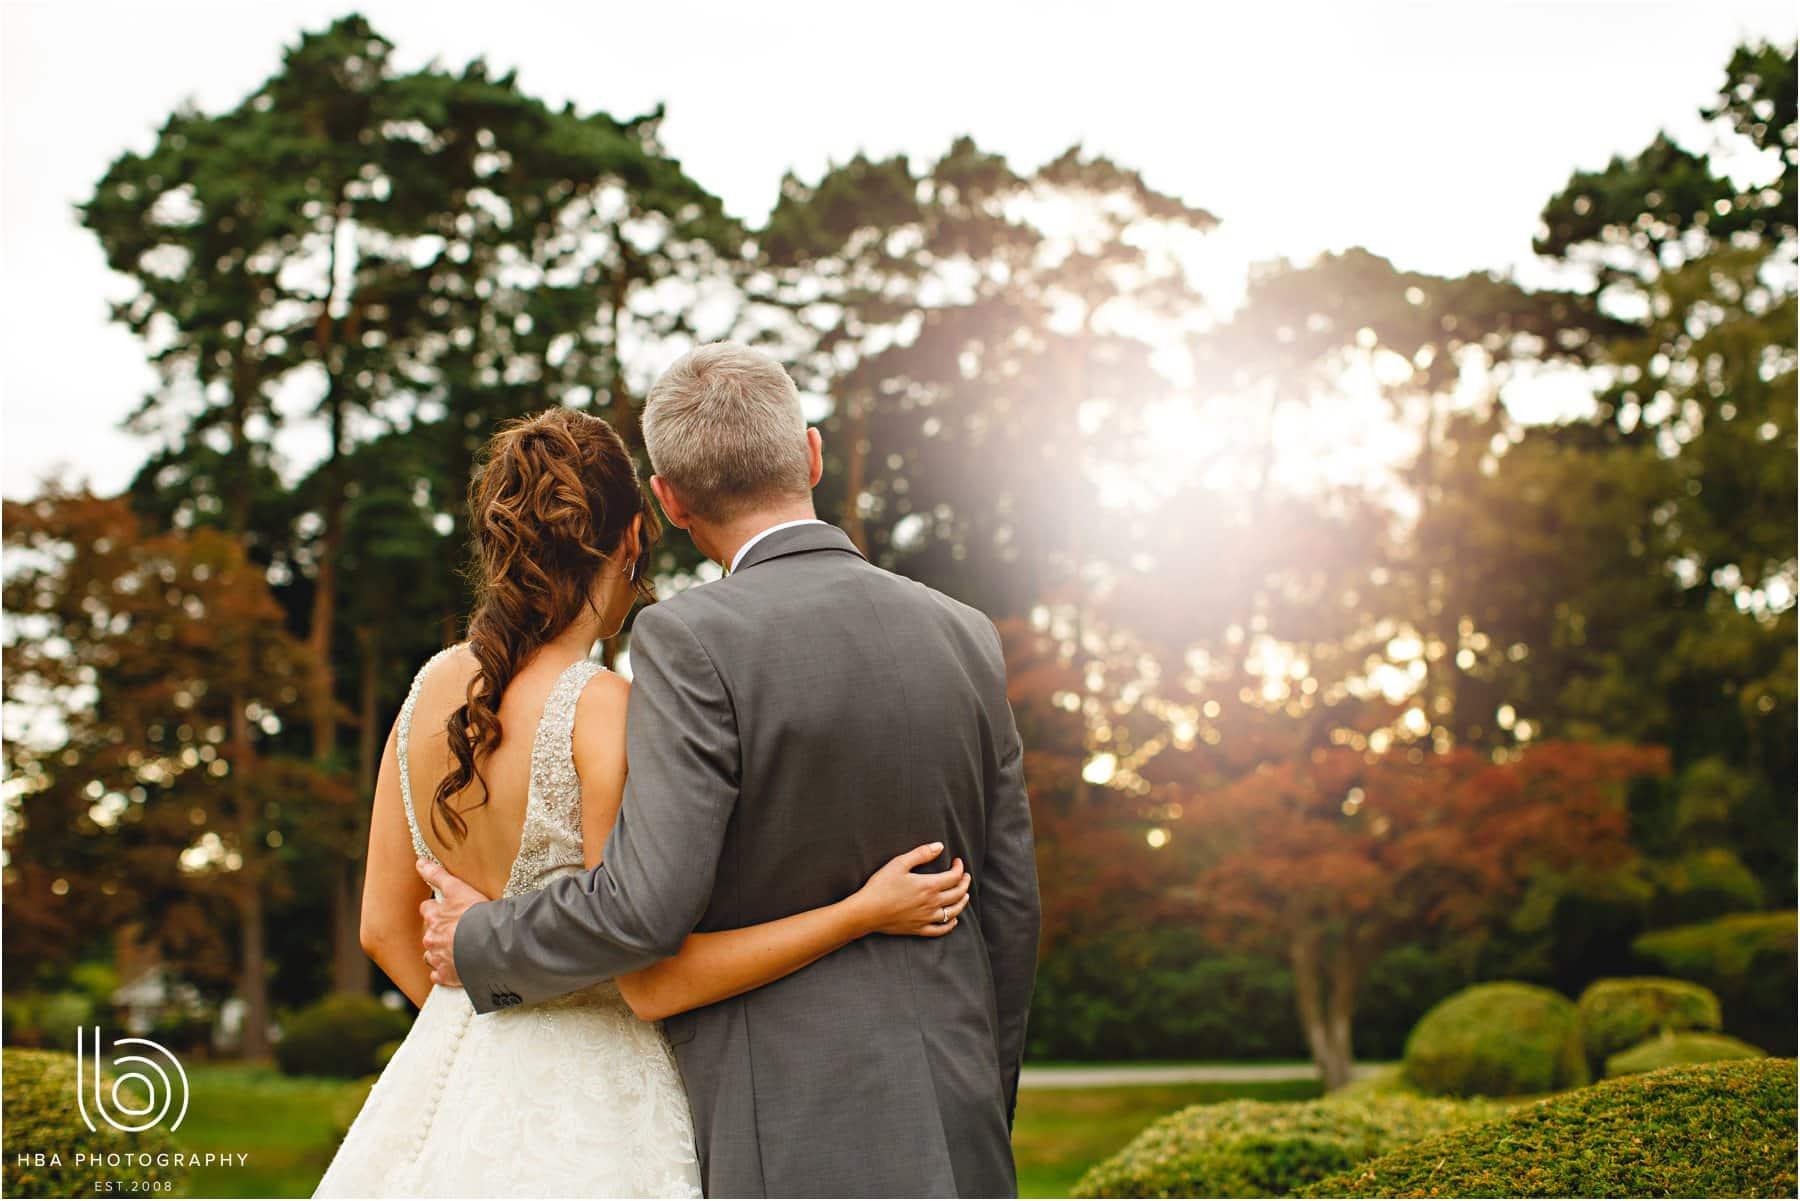 the bride & groom with a sun falre